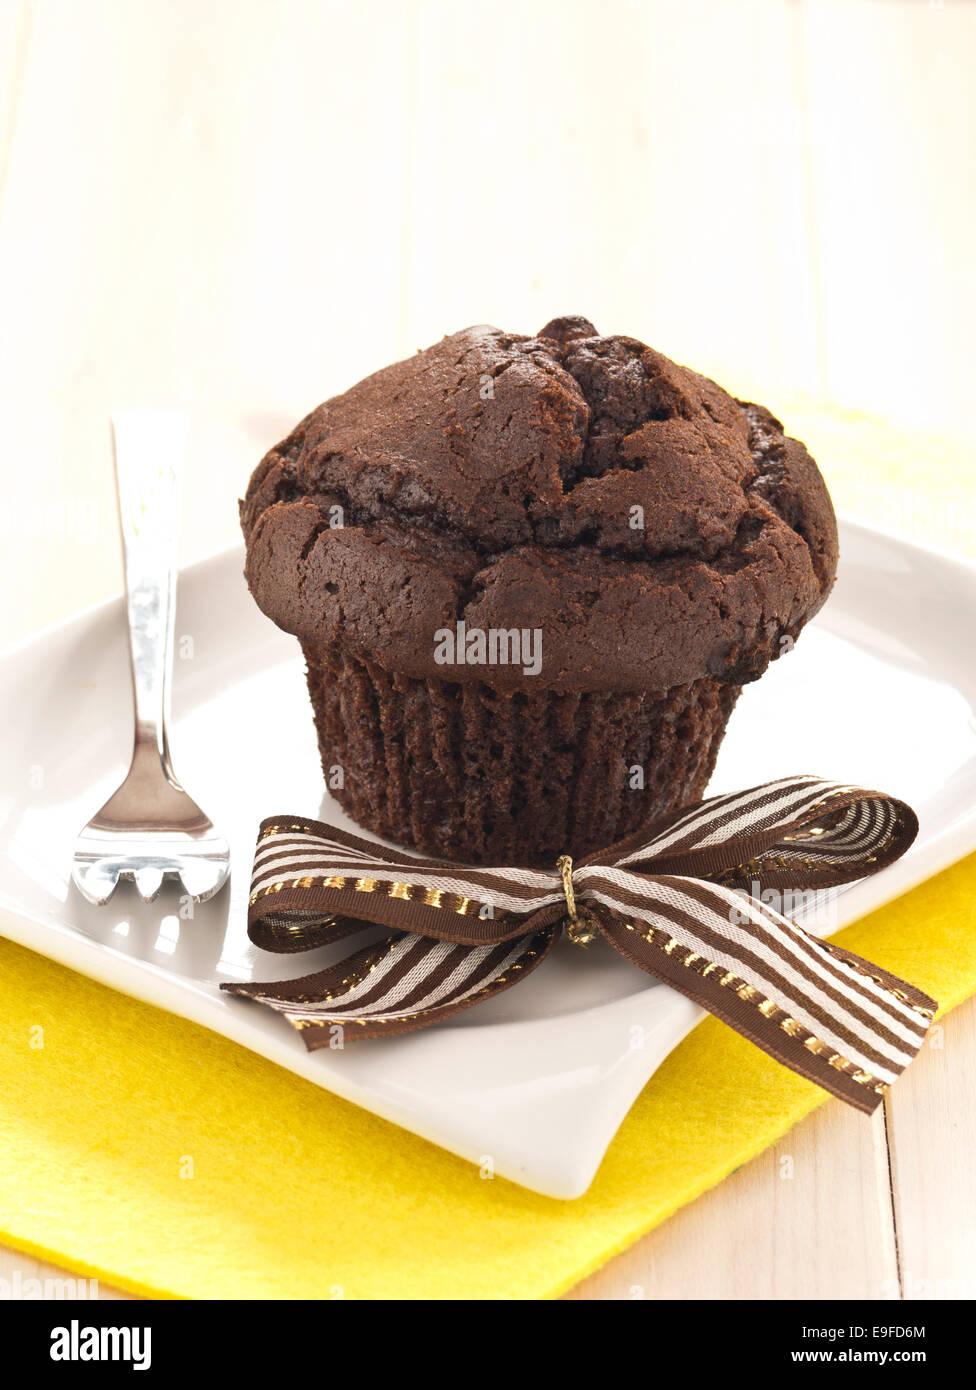 Chocolates Cupcake on a plate Stock Photo